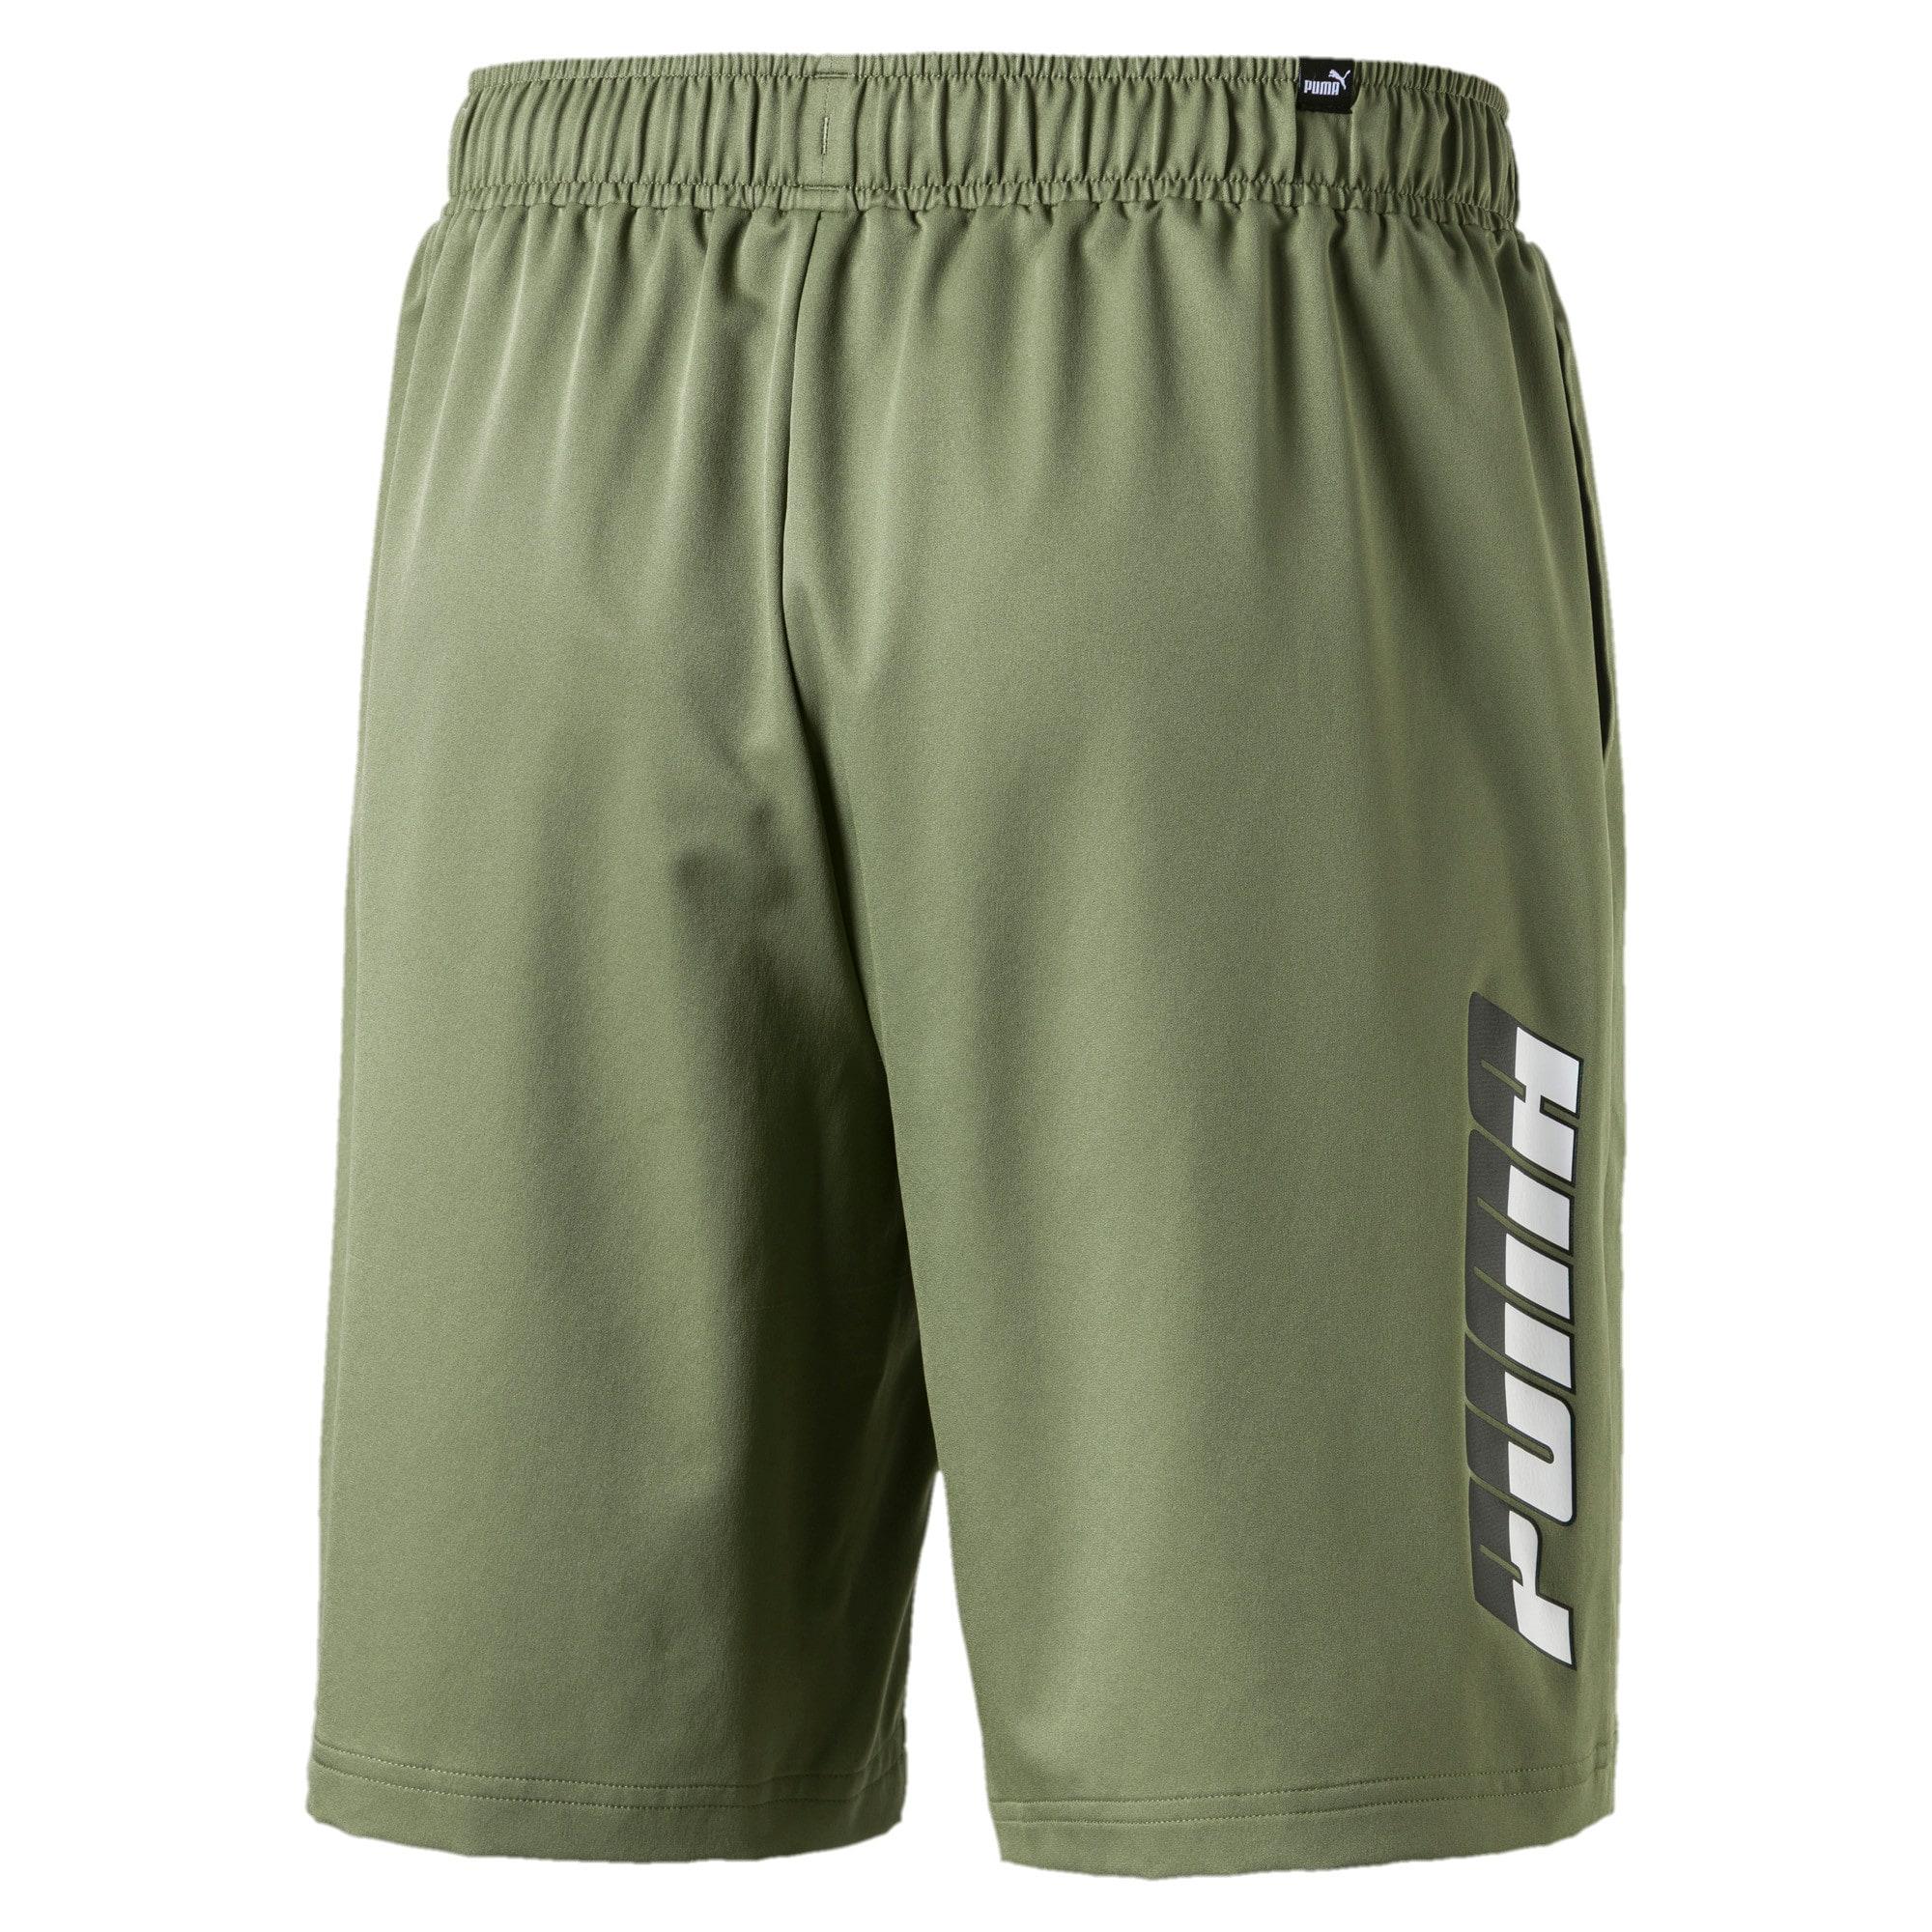 "Thumbnail 3 of Rebel Men's 8"" Woven Shorts, Olivine, medium"